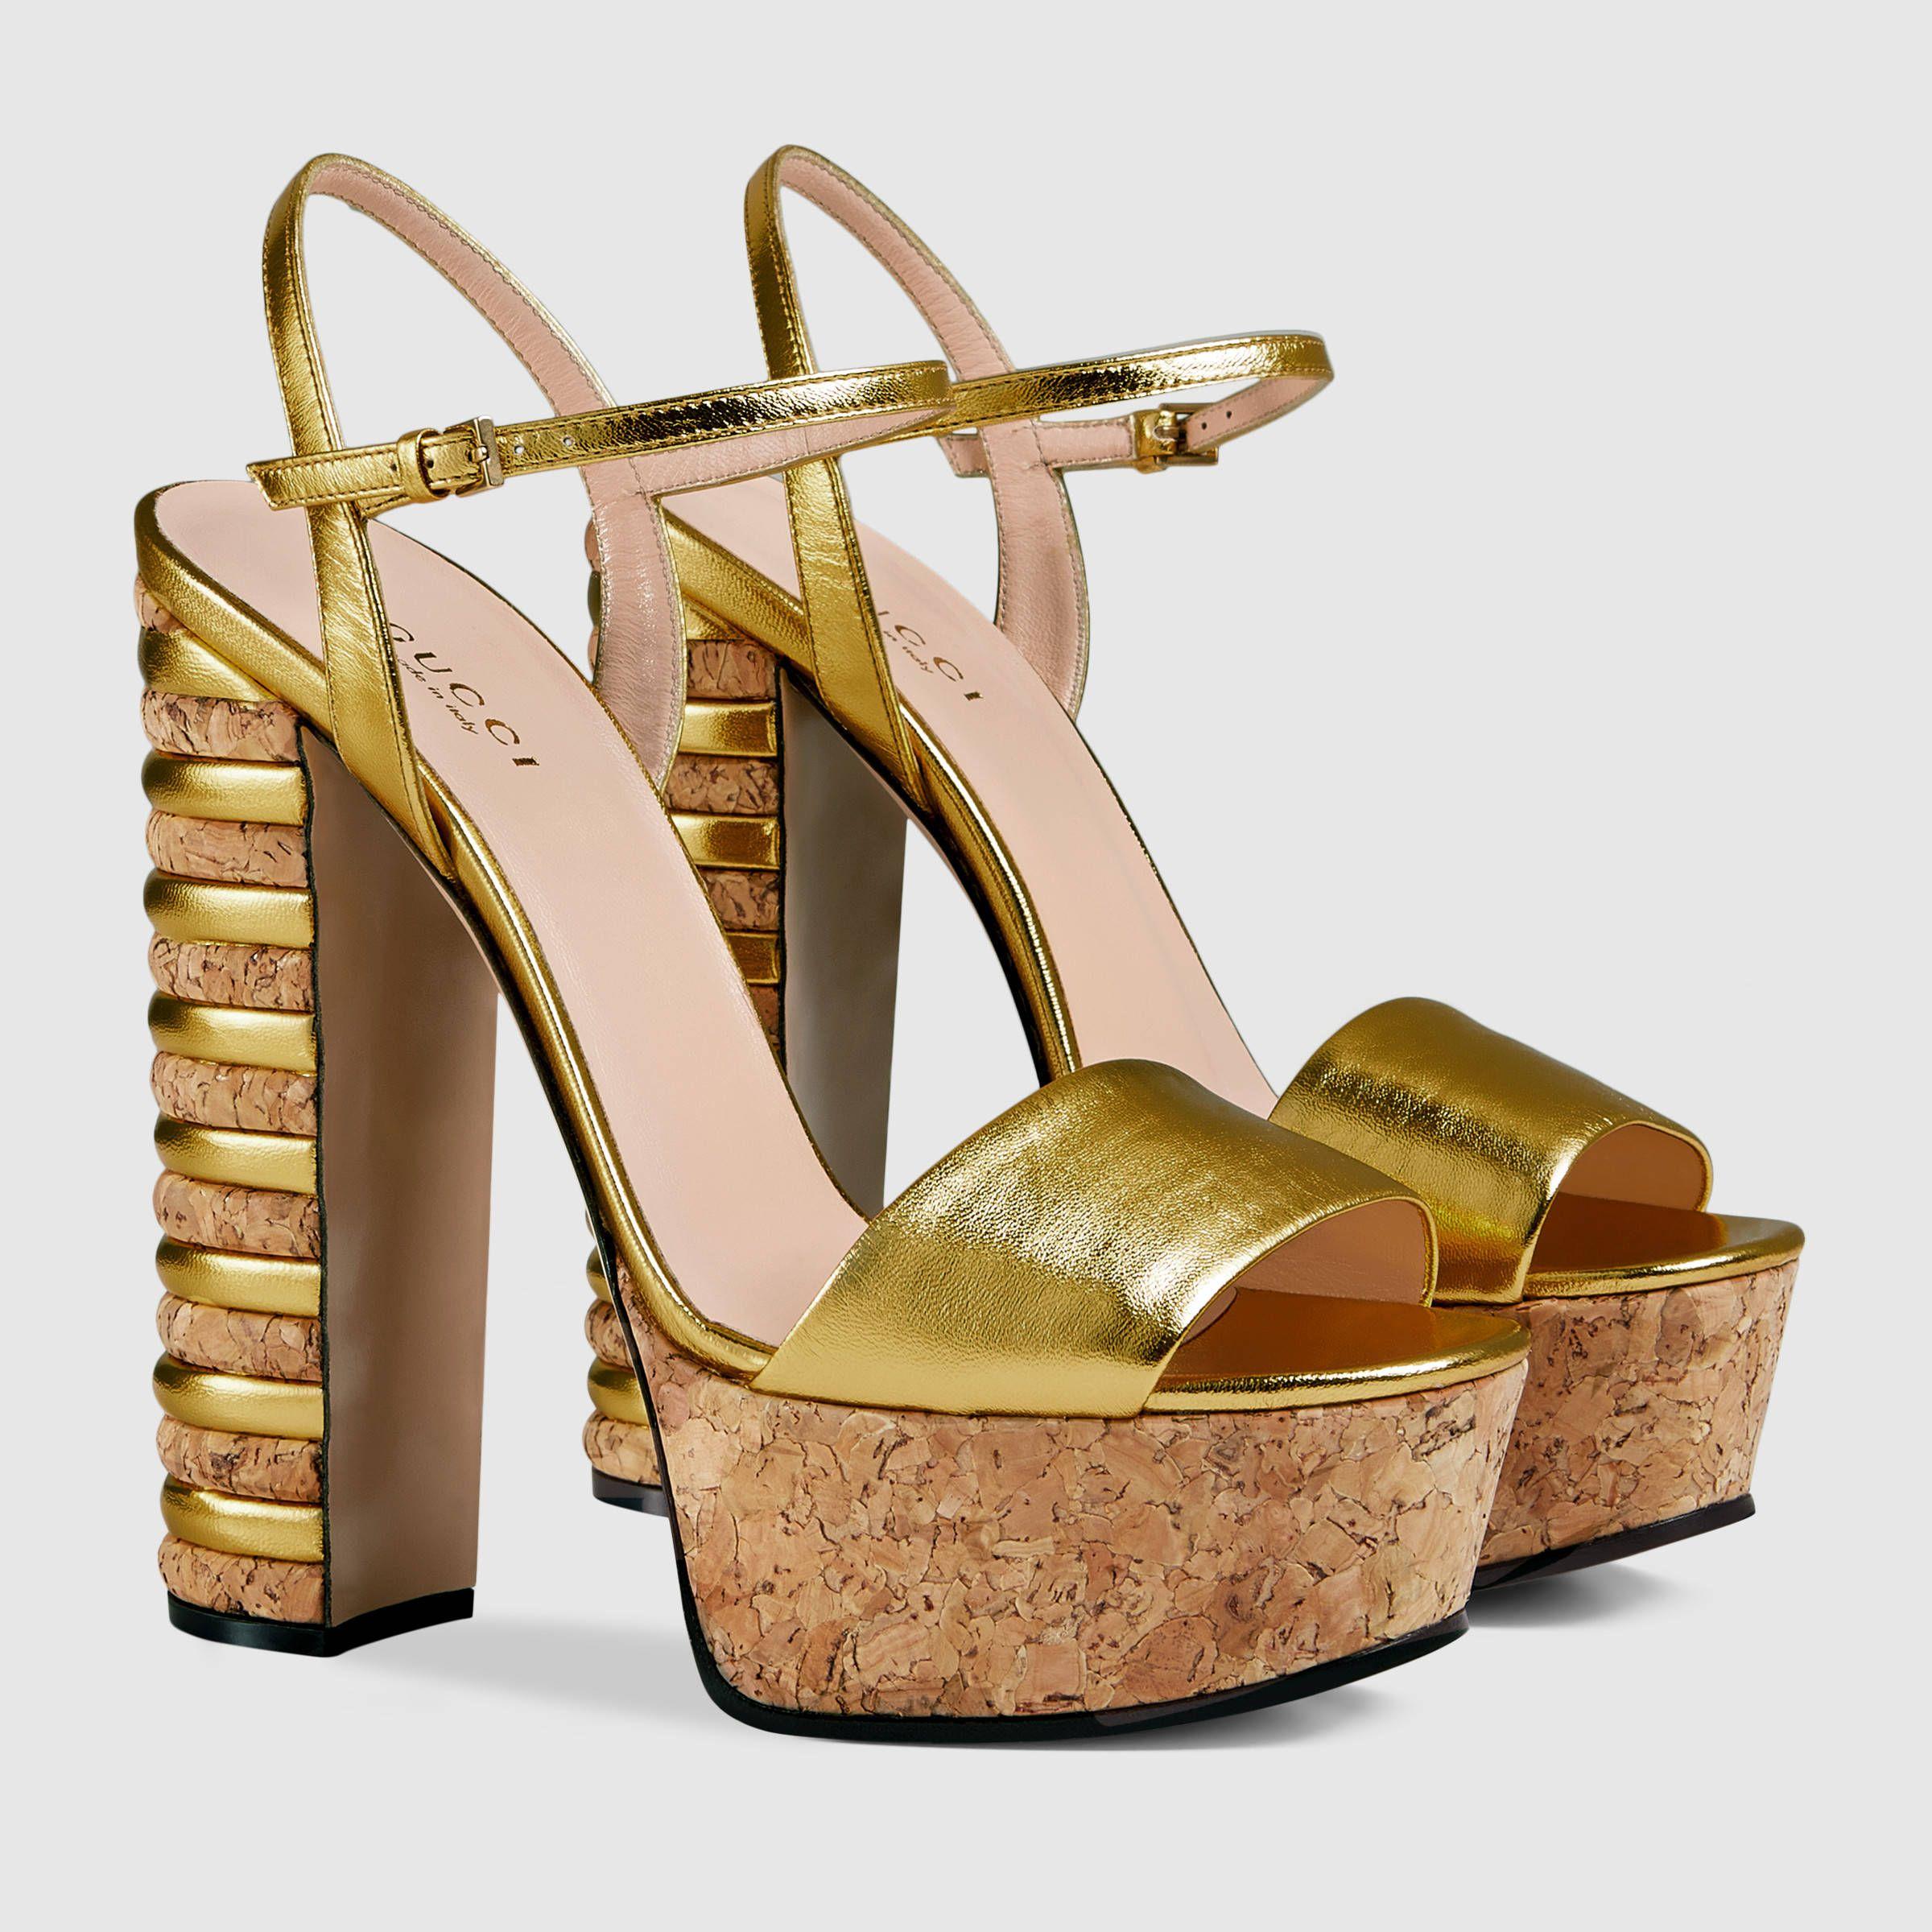 a8b6f2c50e8b Gucci Women - Gucci Metallic Gold leather platform sandals -  890.00 ...